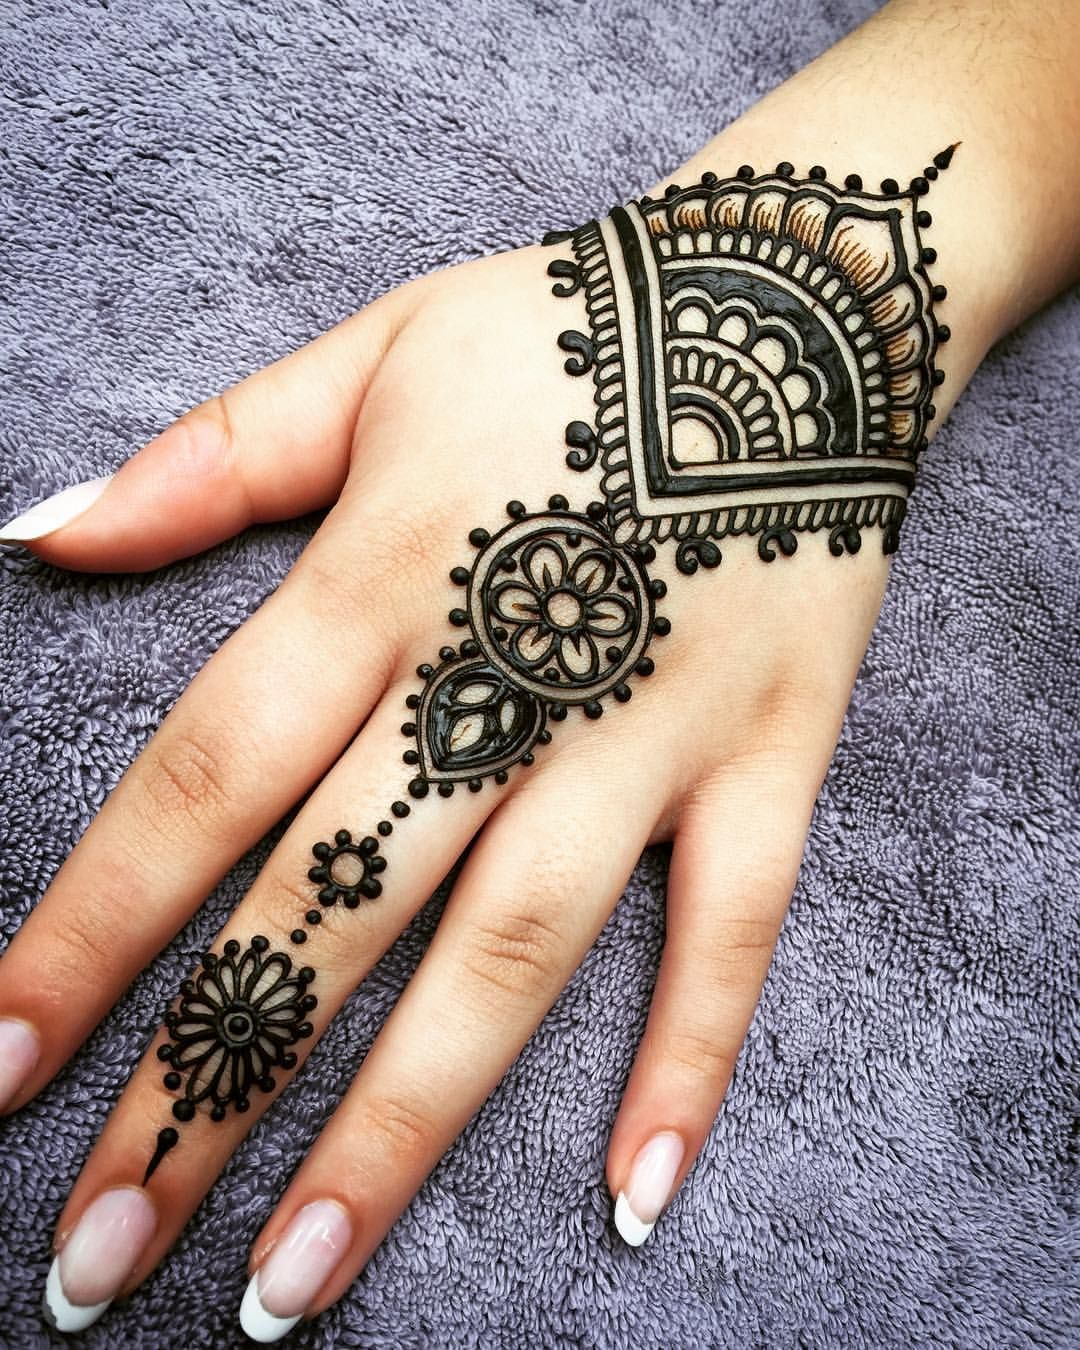 220 Easy Mehndi Designs For Left Hand Right Hand Front Hand Back Hand 2020,Spiritual Line Art Geometric Tattoo Designs